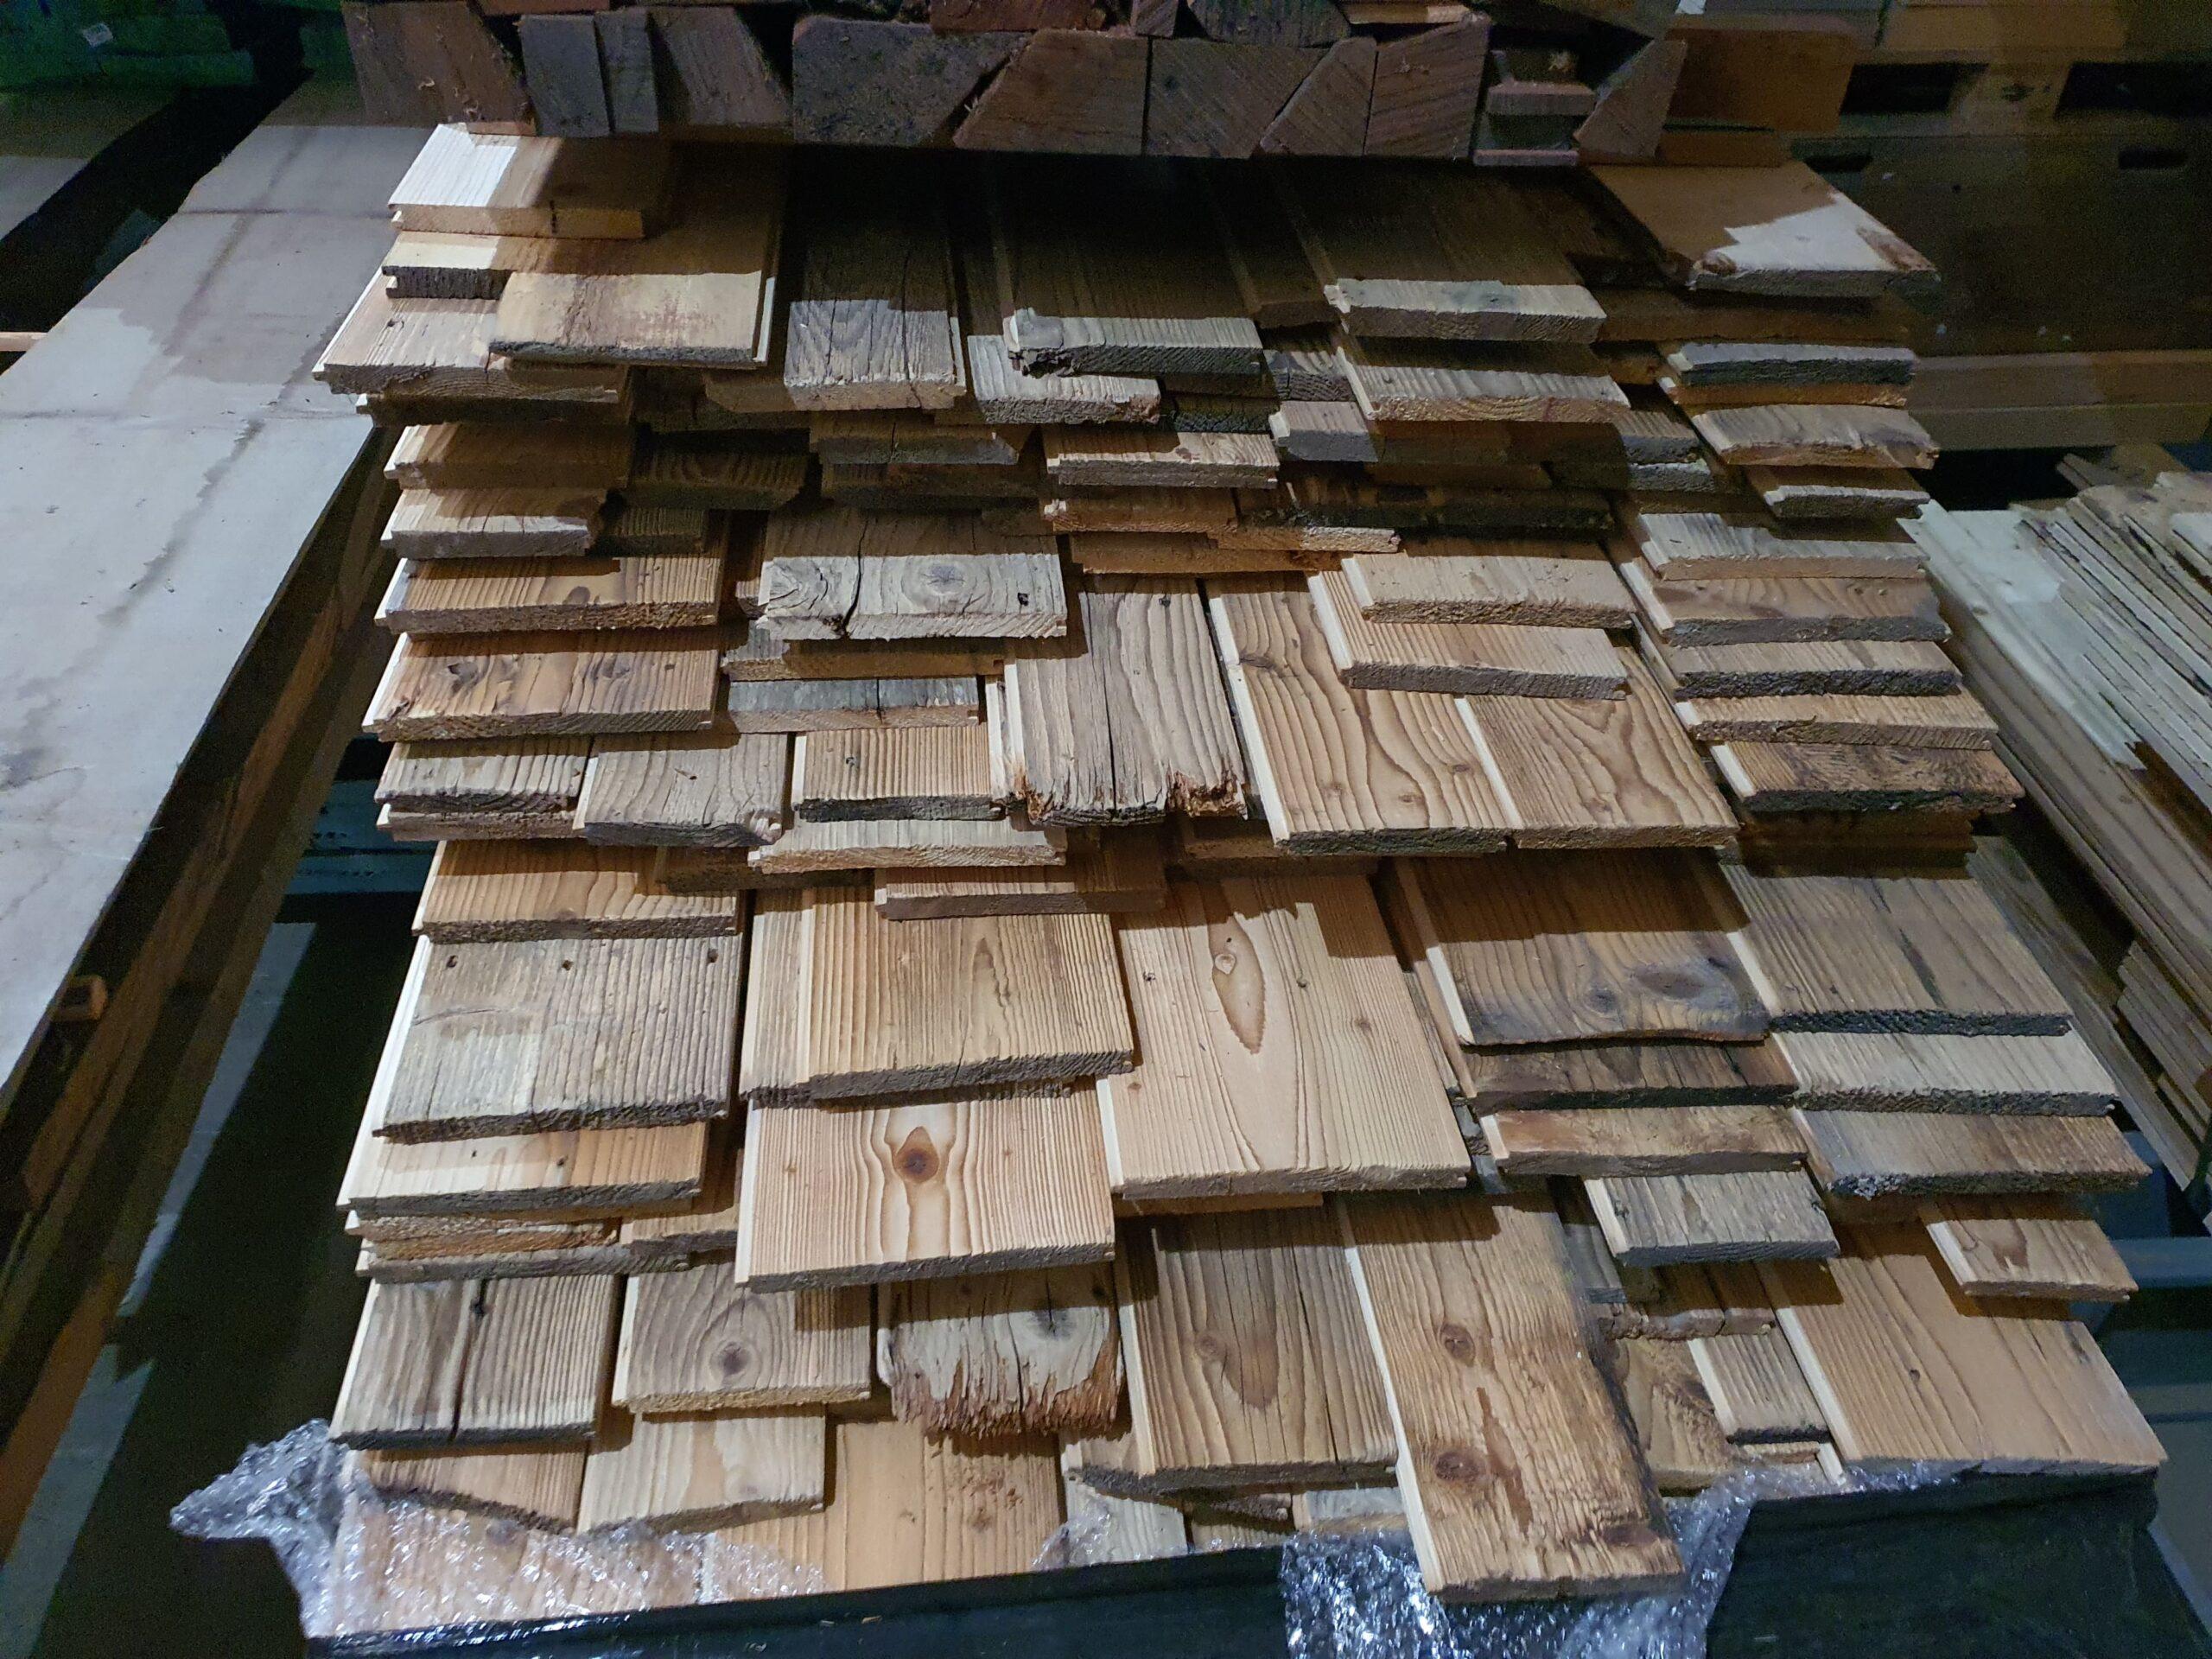 Wooddesign_Holzdesign_Altholzplatten_ Altholz_Eiche Altholz_Altholztäfer_alte Beschläge_Altholzkleidungen(2)